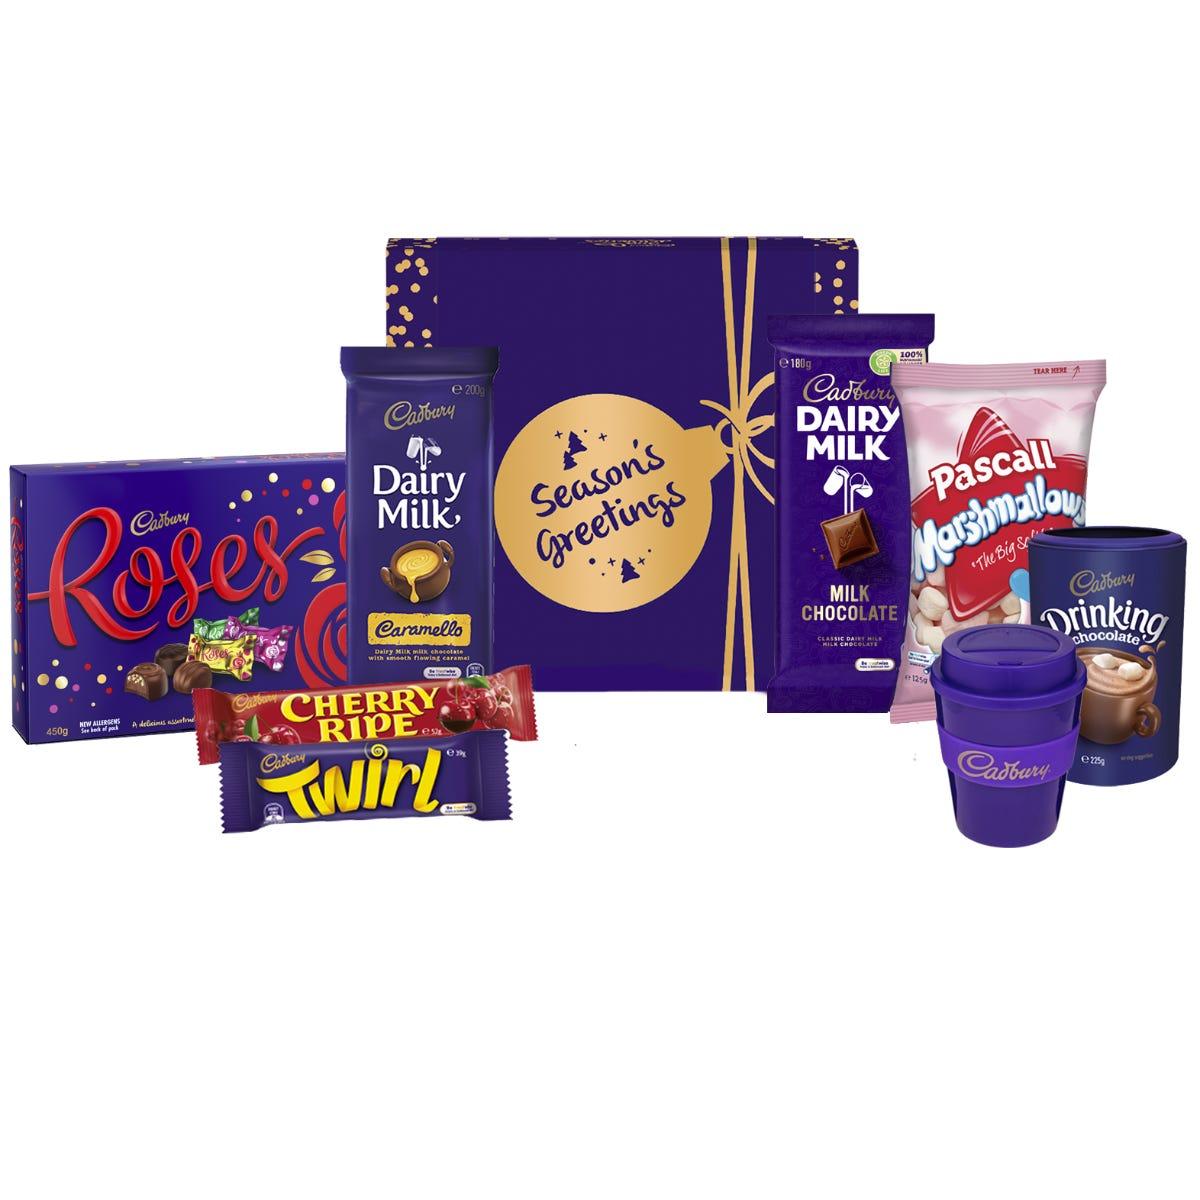 Cadbury Roses Indulgence Hamper - Season's Greetings